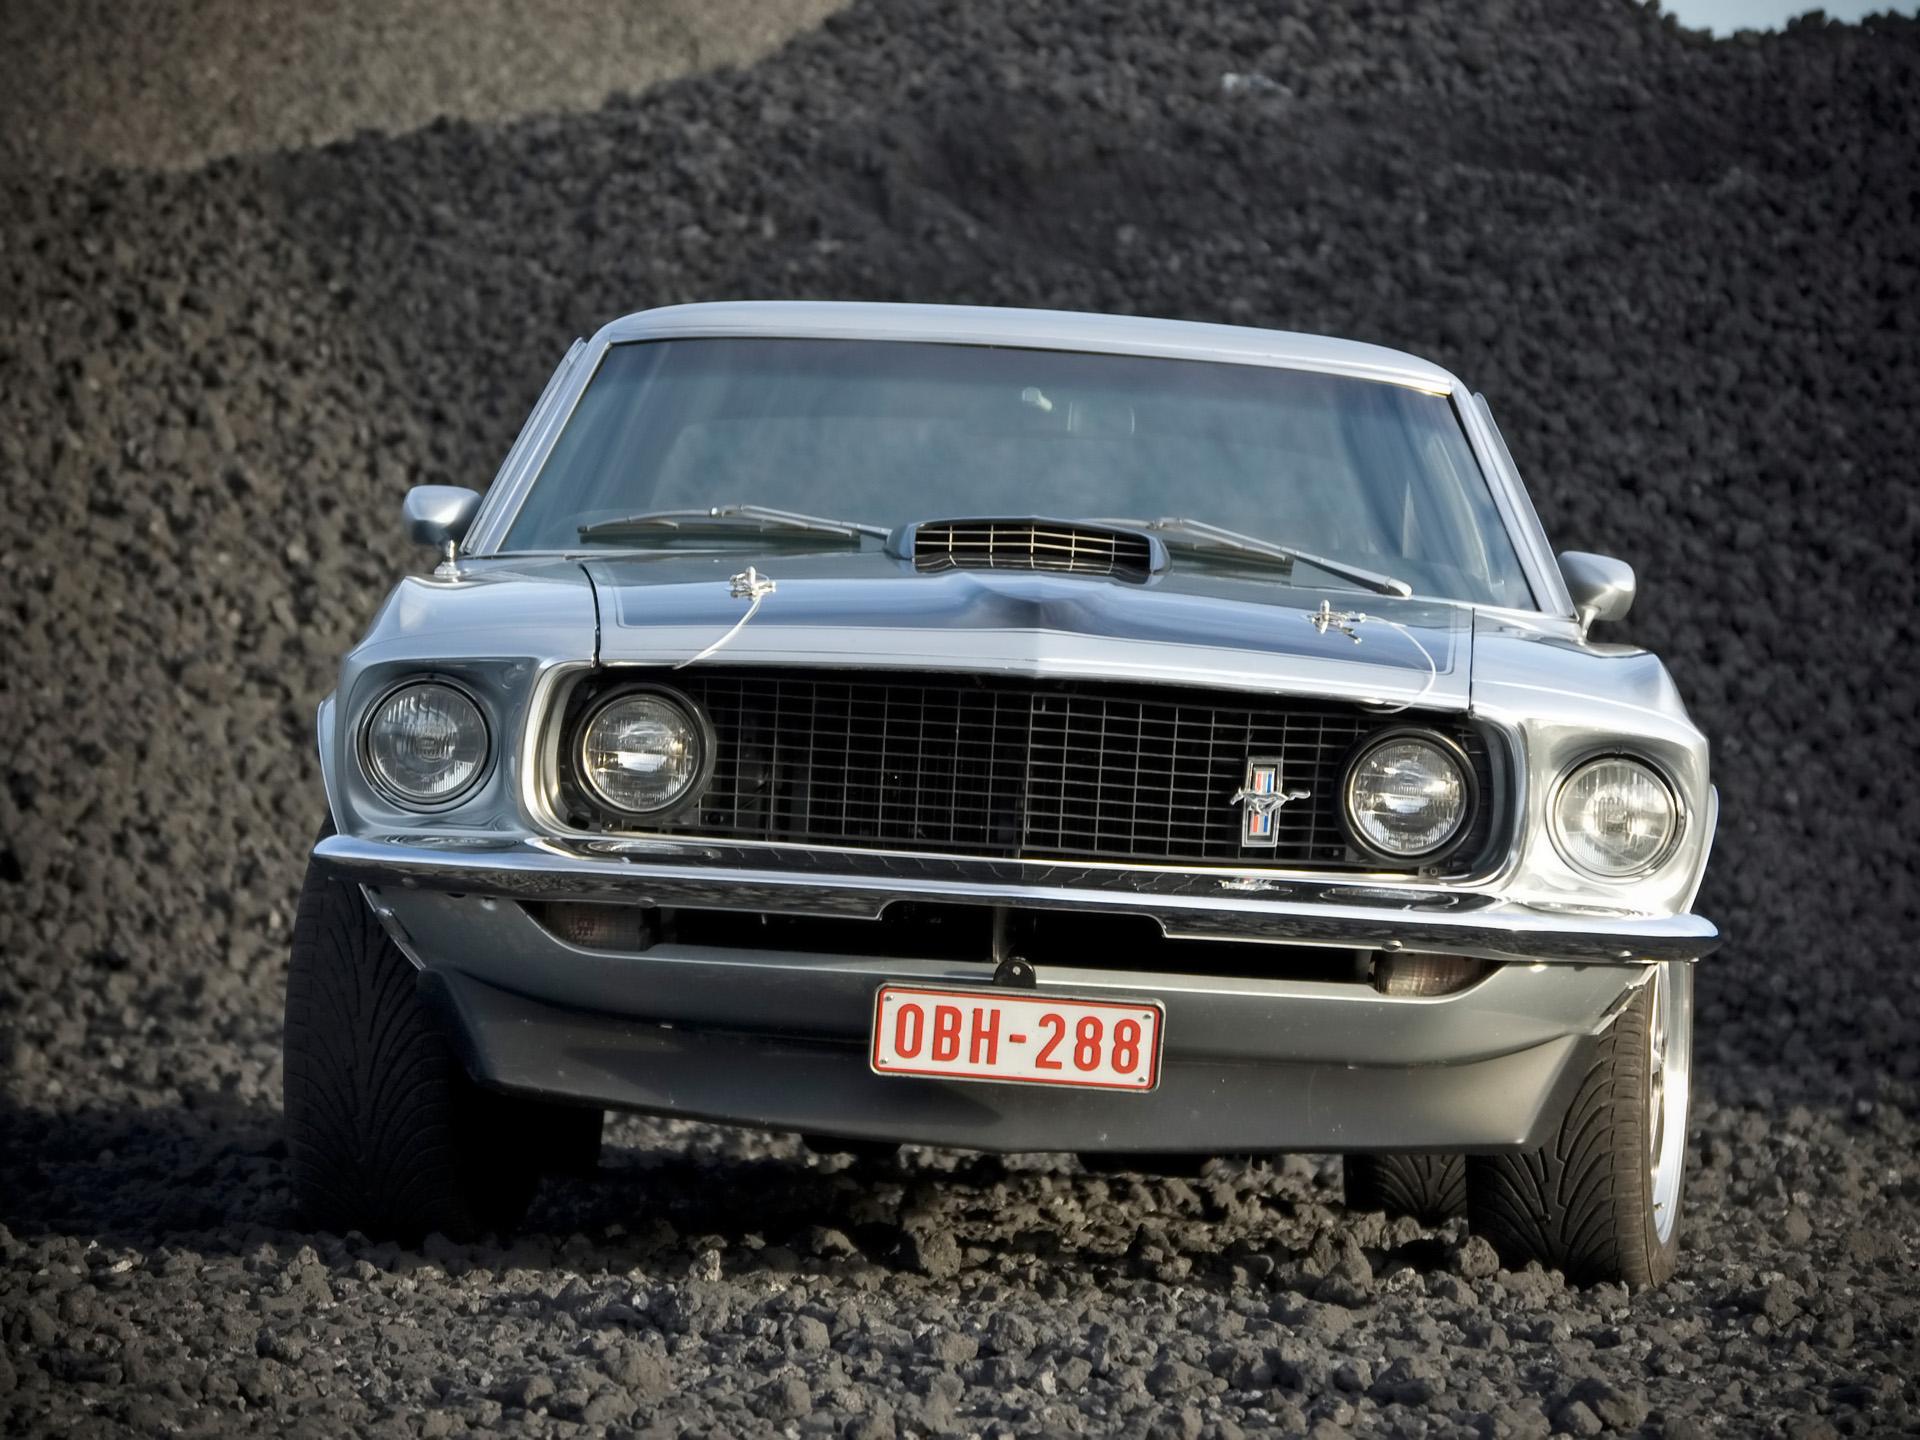 1969 ford mustang hardtop front tilt 1920x1440 jpg